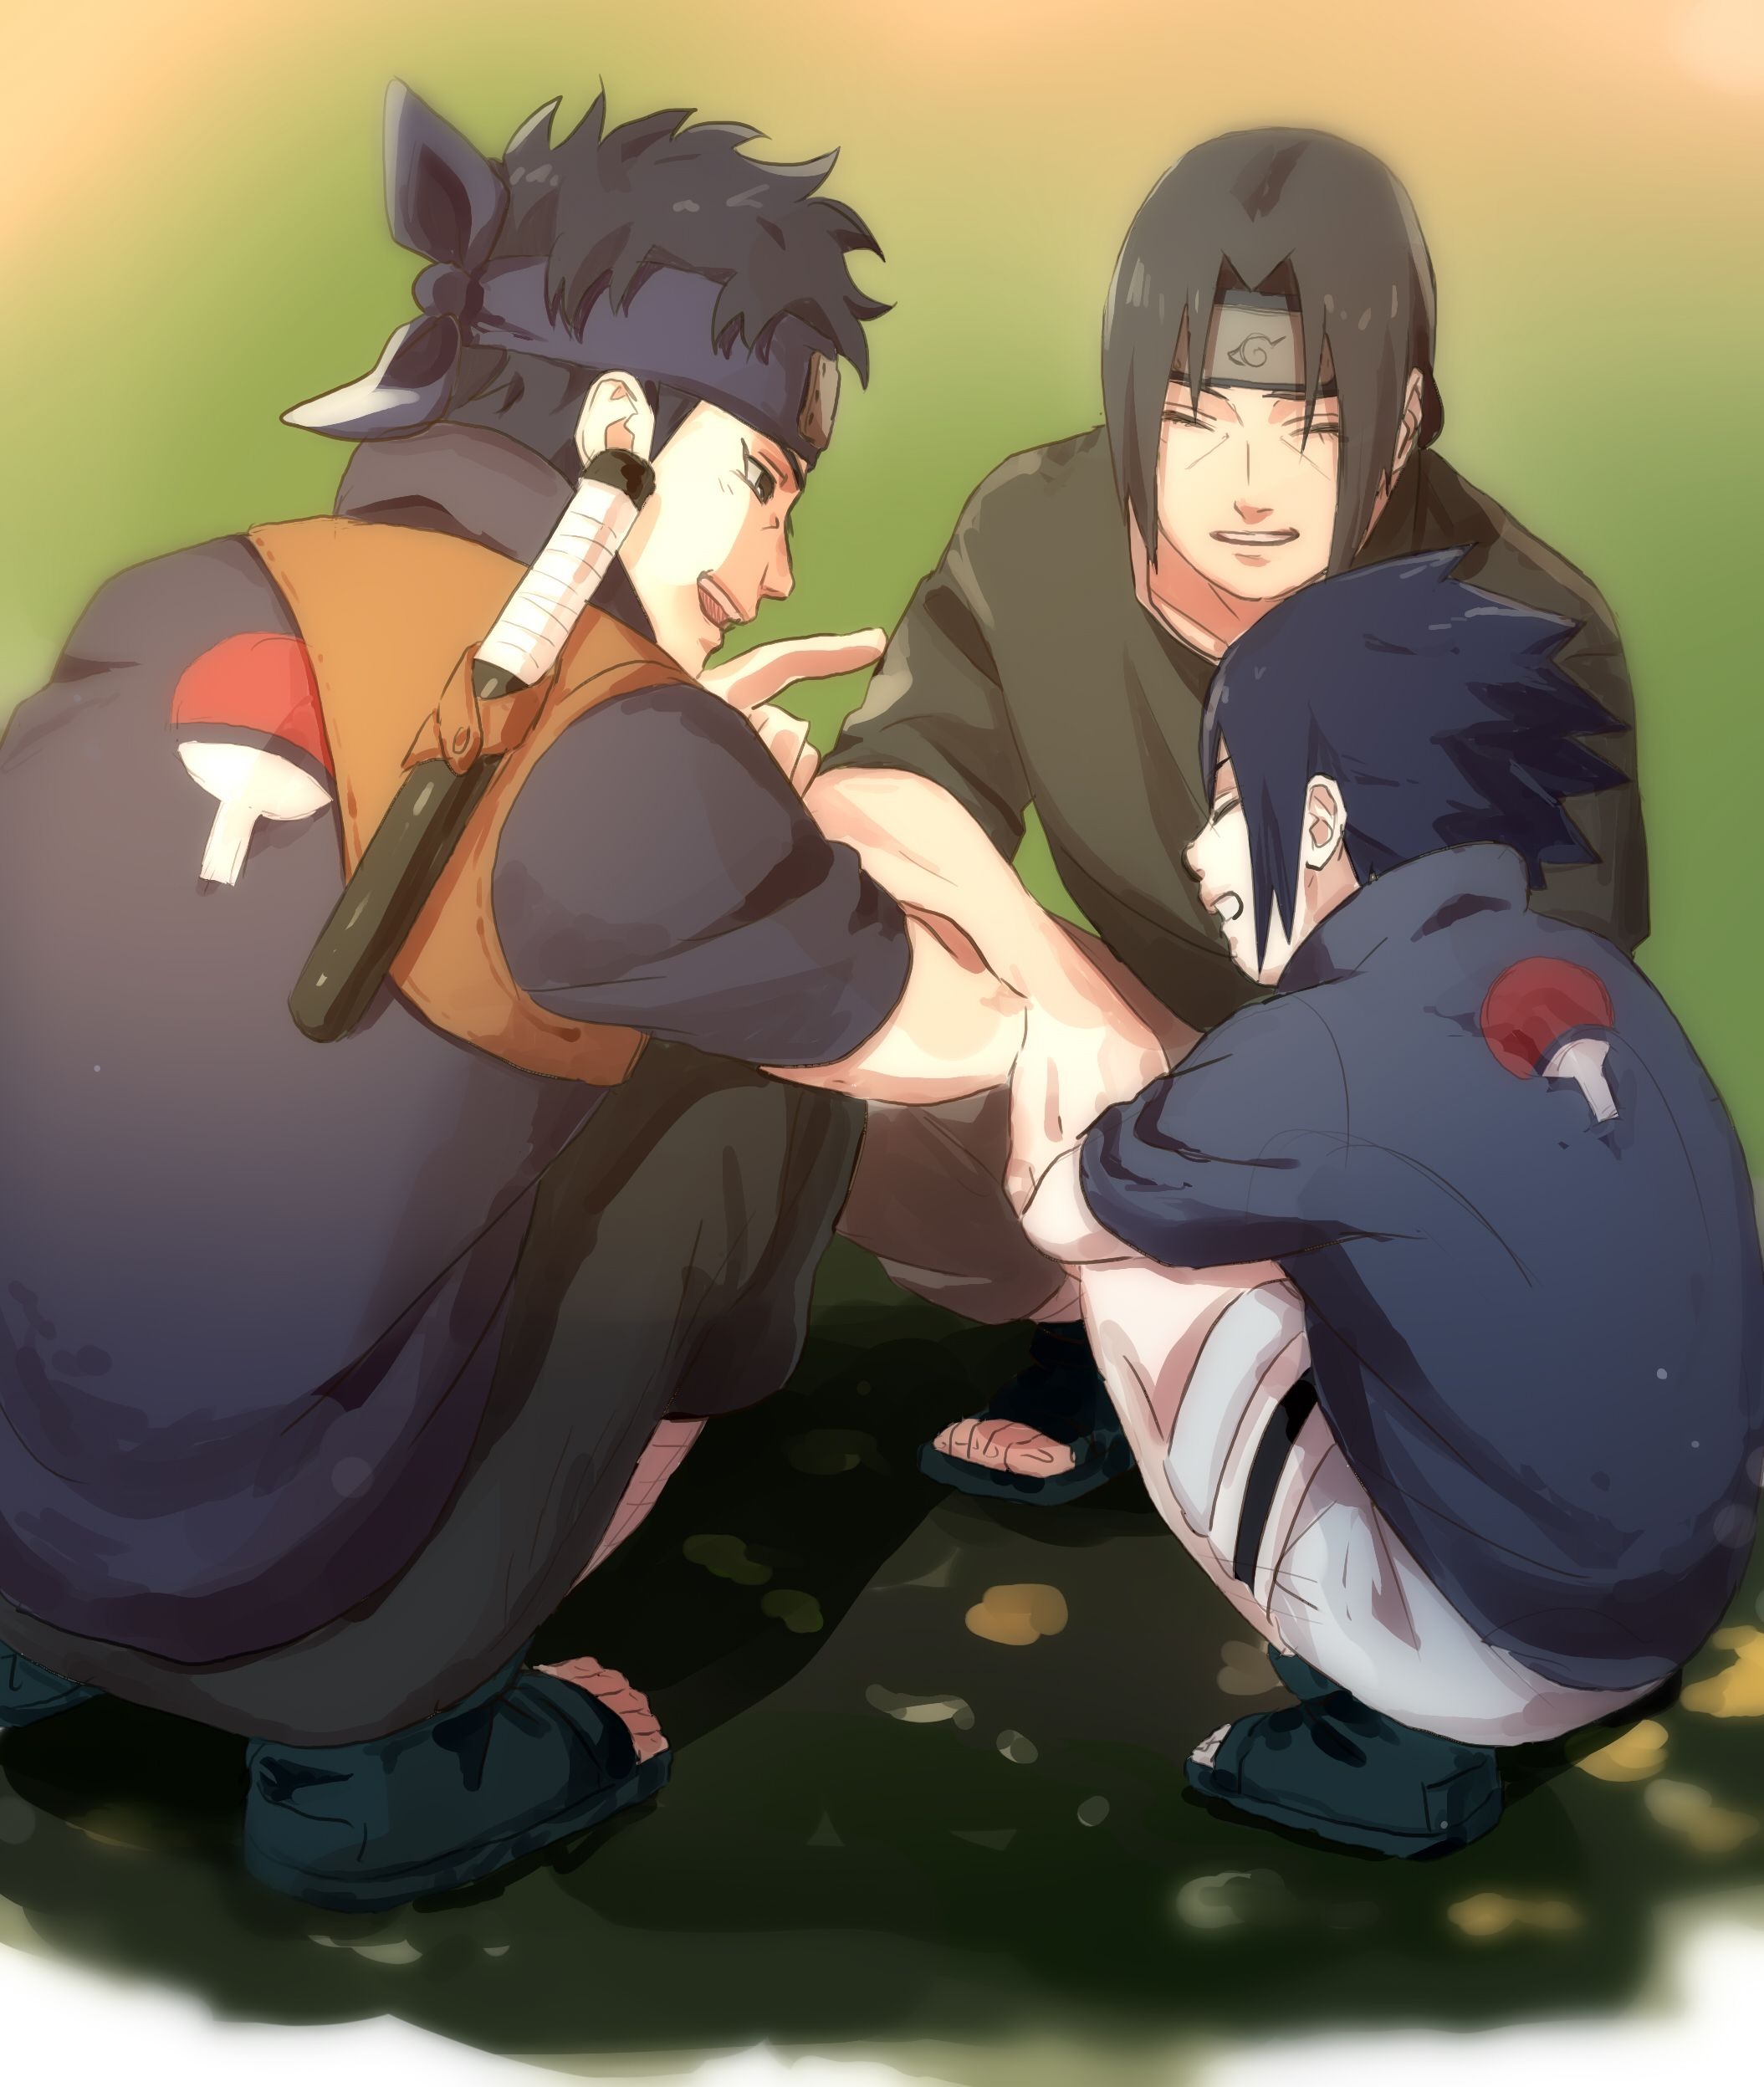 Tags: NARUTO, Uchiha Sasuke, Uchiha Itachi, Uchiha Shisui